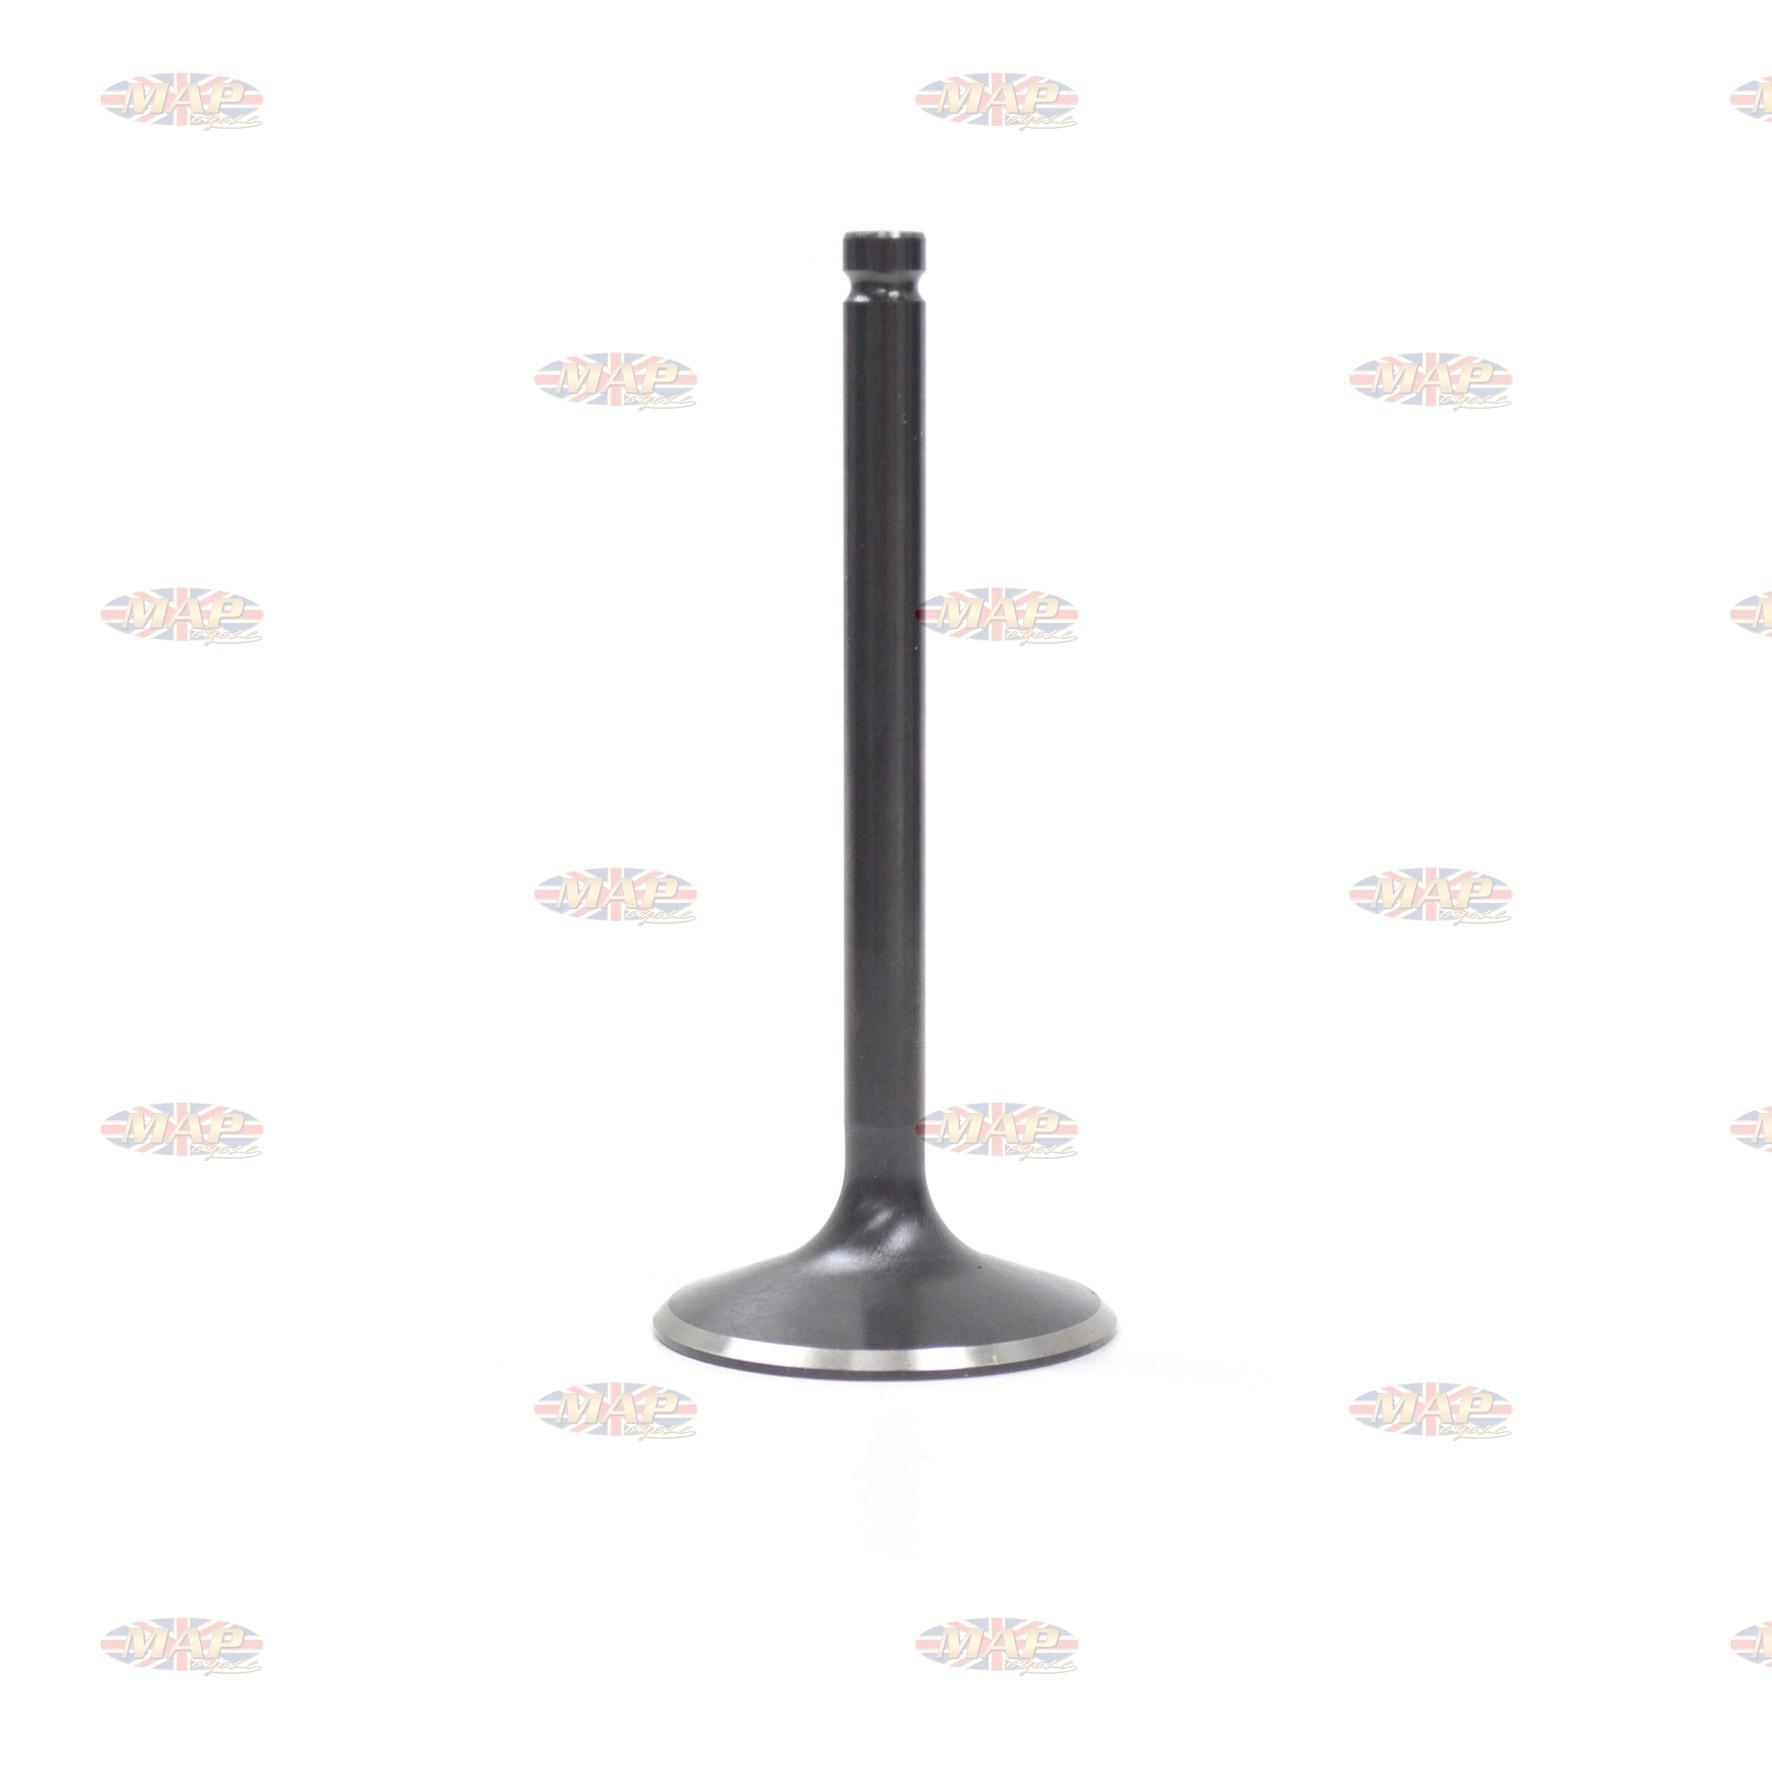 "BSA B50 High Quality Black Diamond Standard 1.750"" Intake Valve 71-1735/BD"